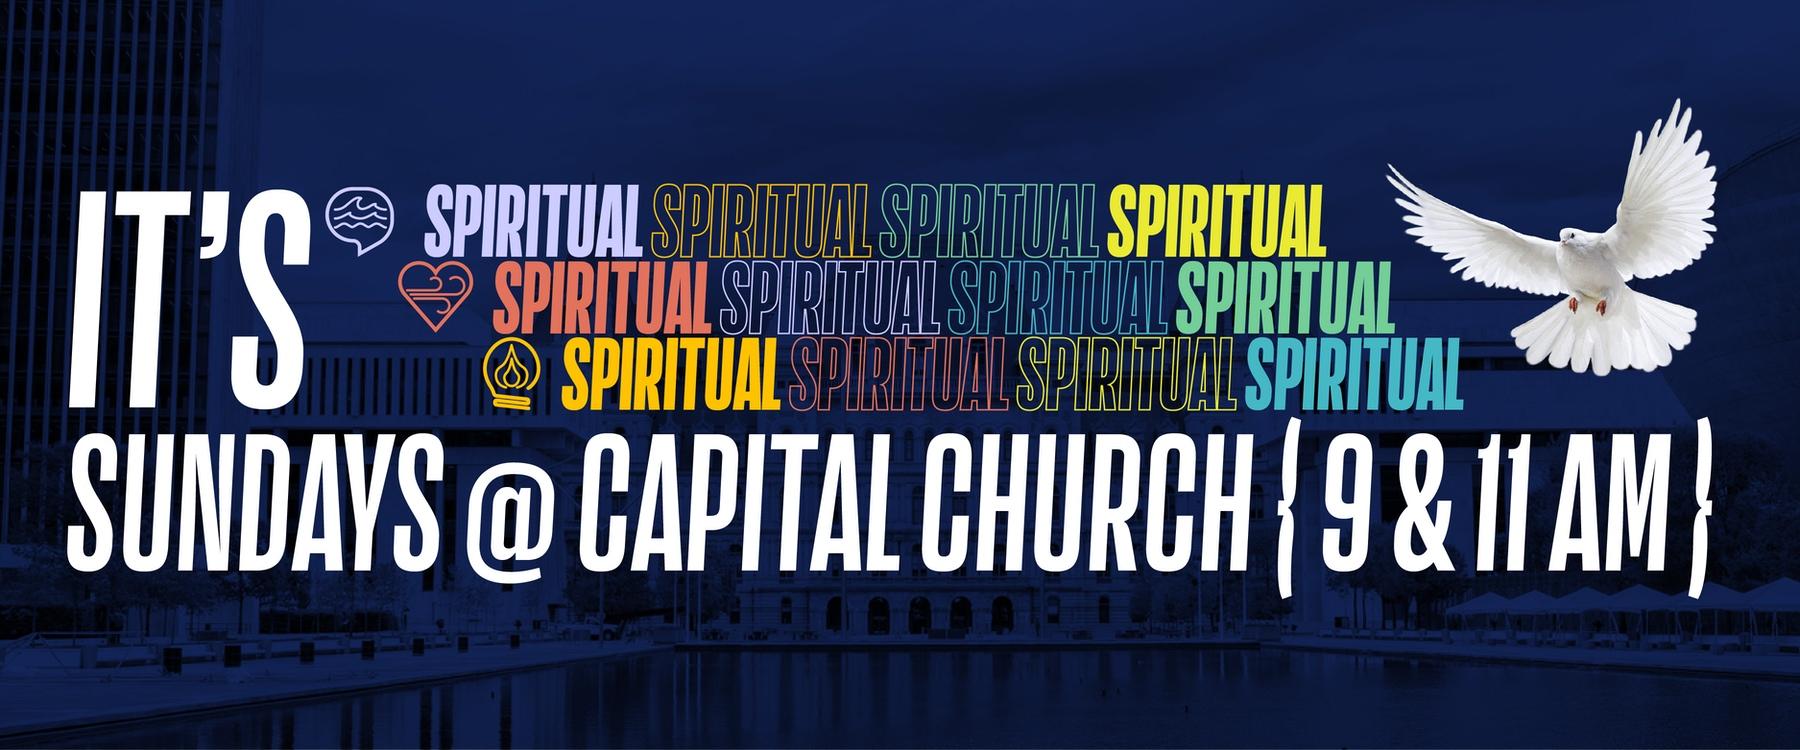 Spiritual_Web_1800-750_B.SMALL